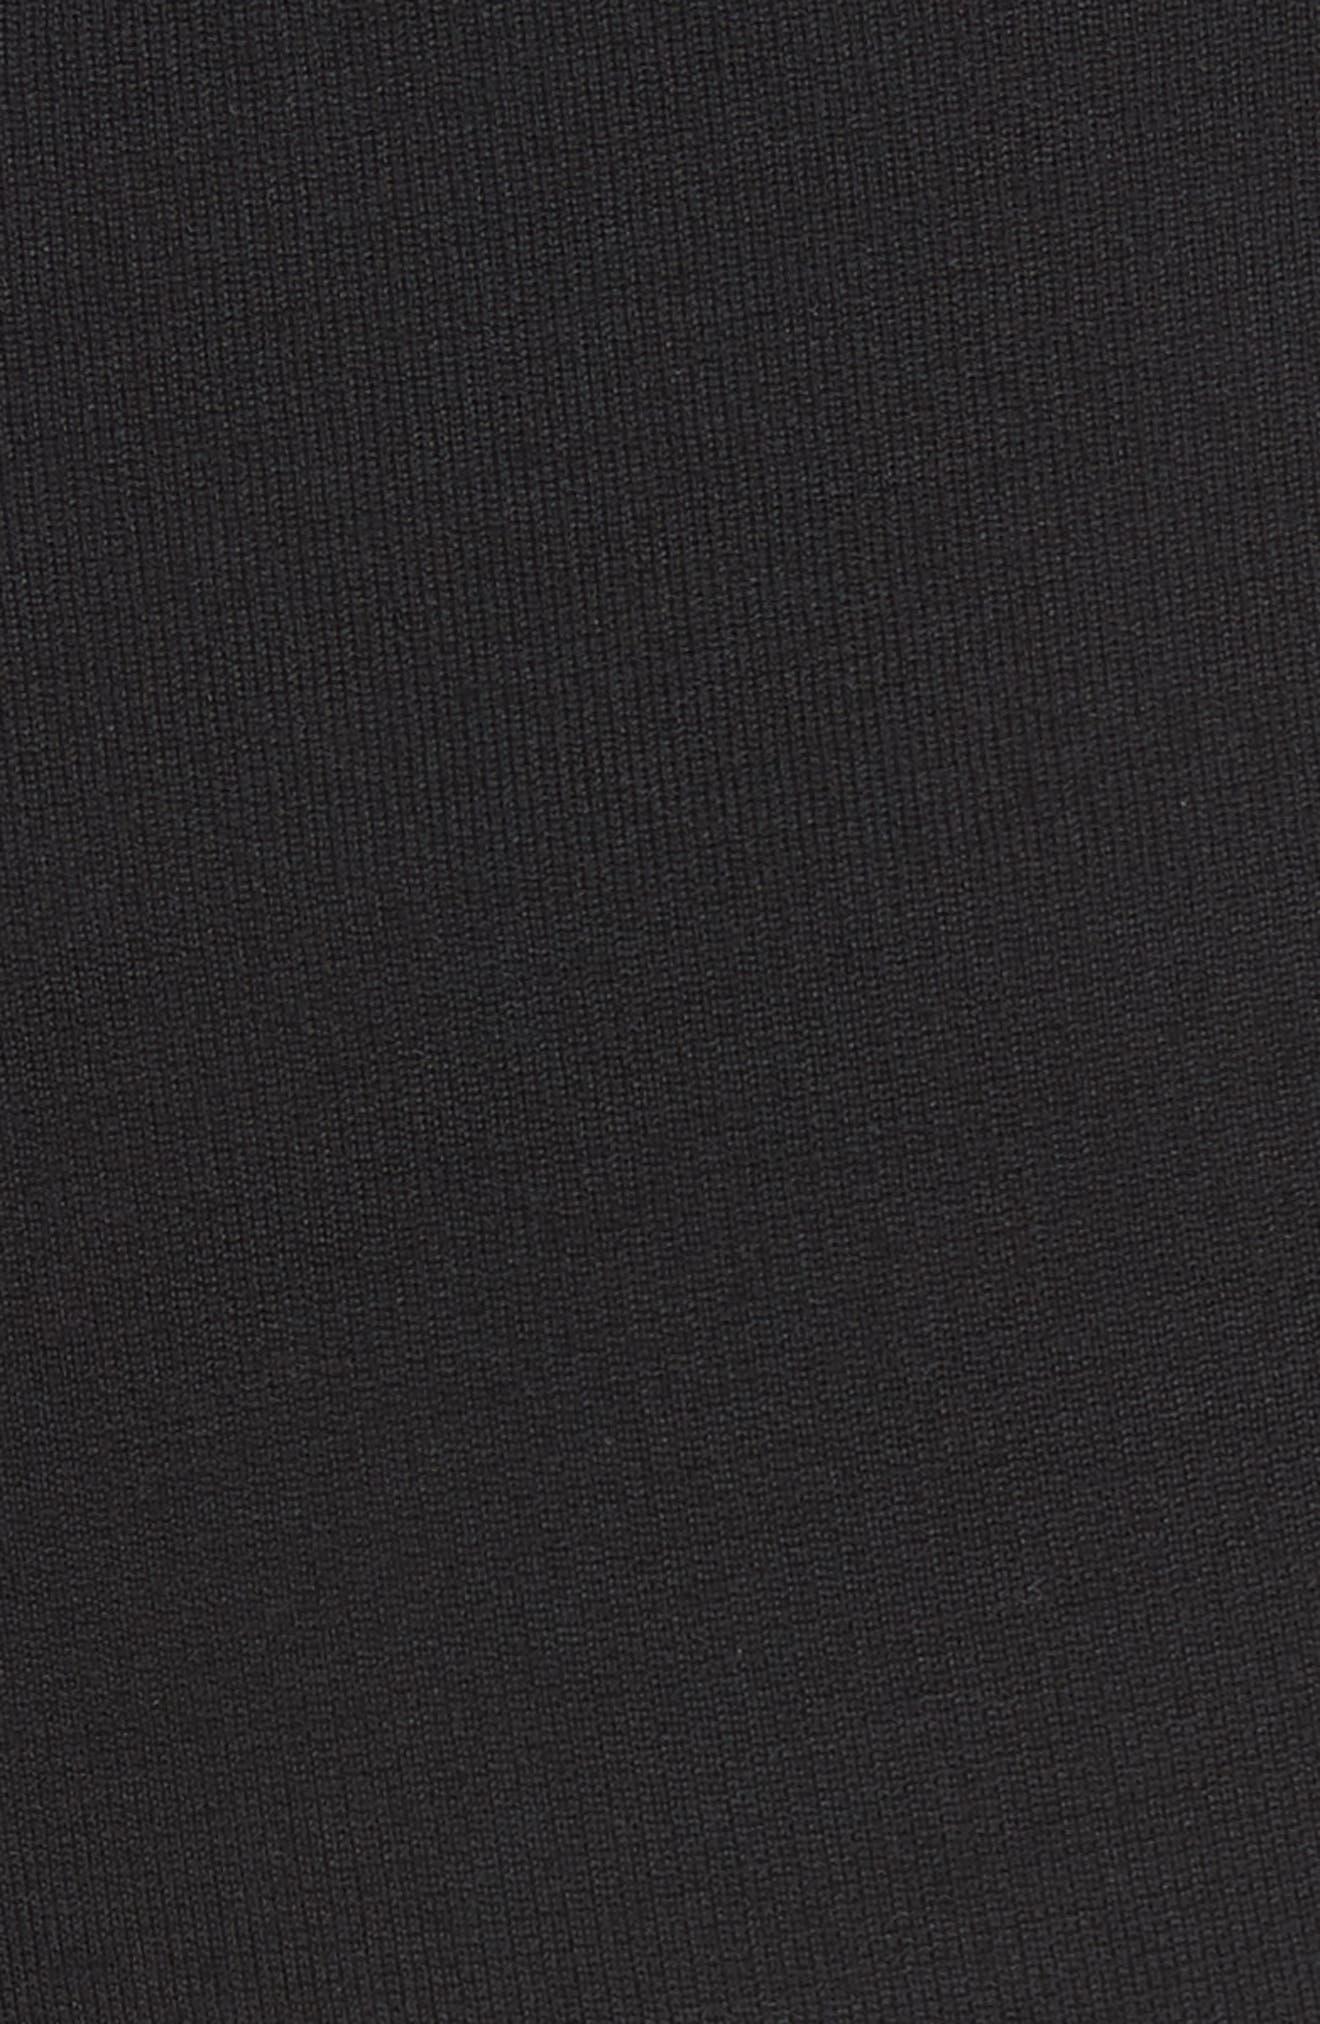 Alexa Milano Knit Pants,                             Alternate thumbnail 5, color,                             CAVIAR